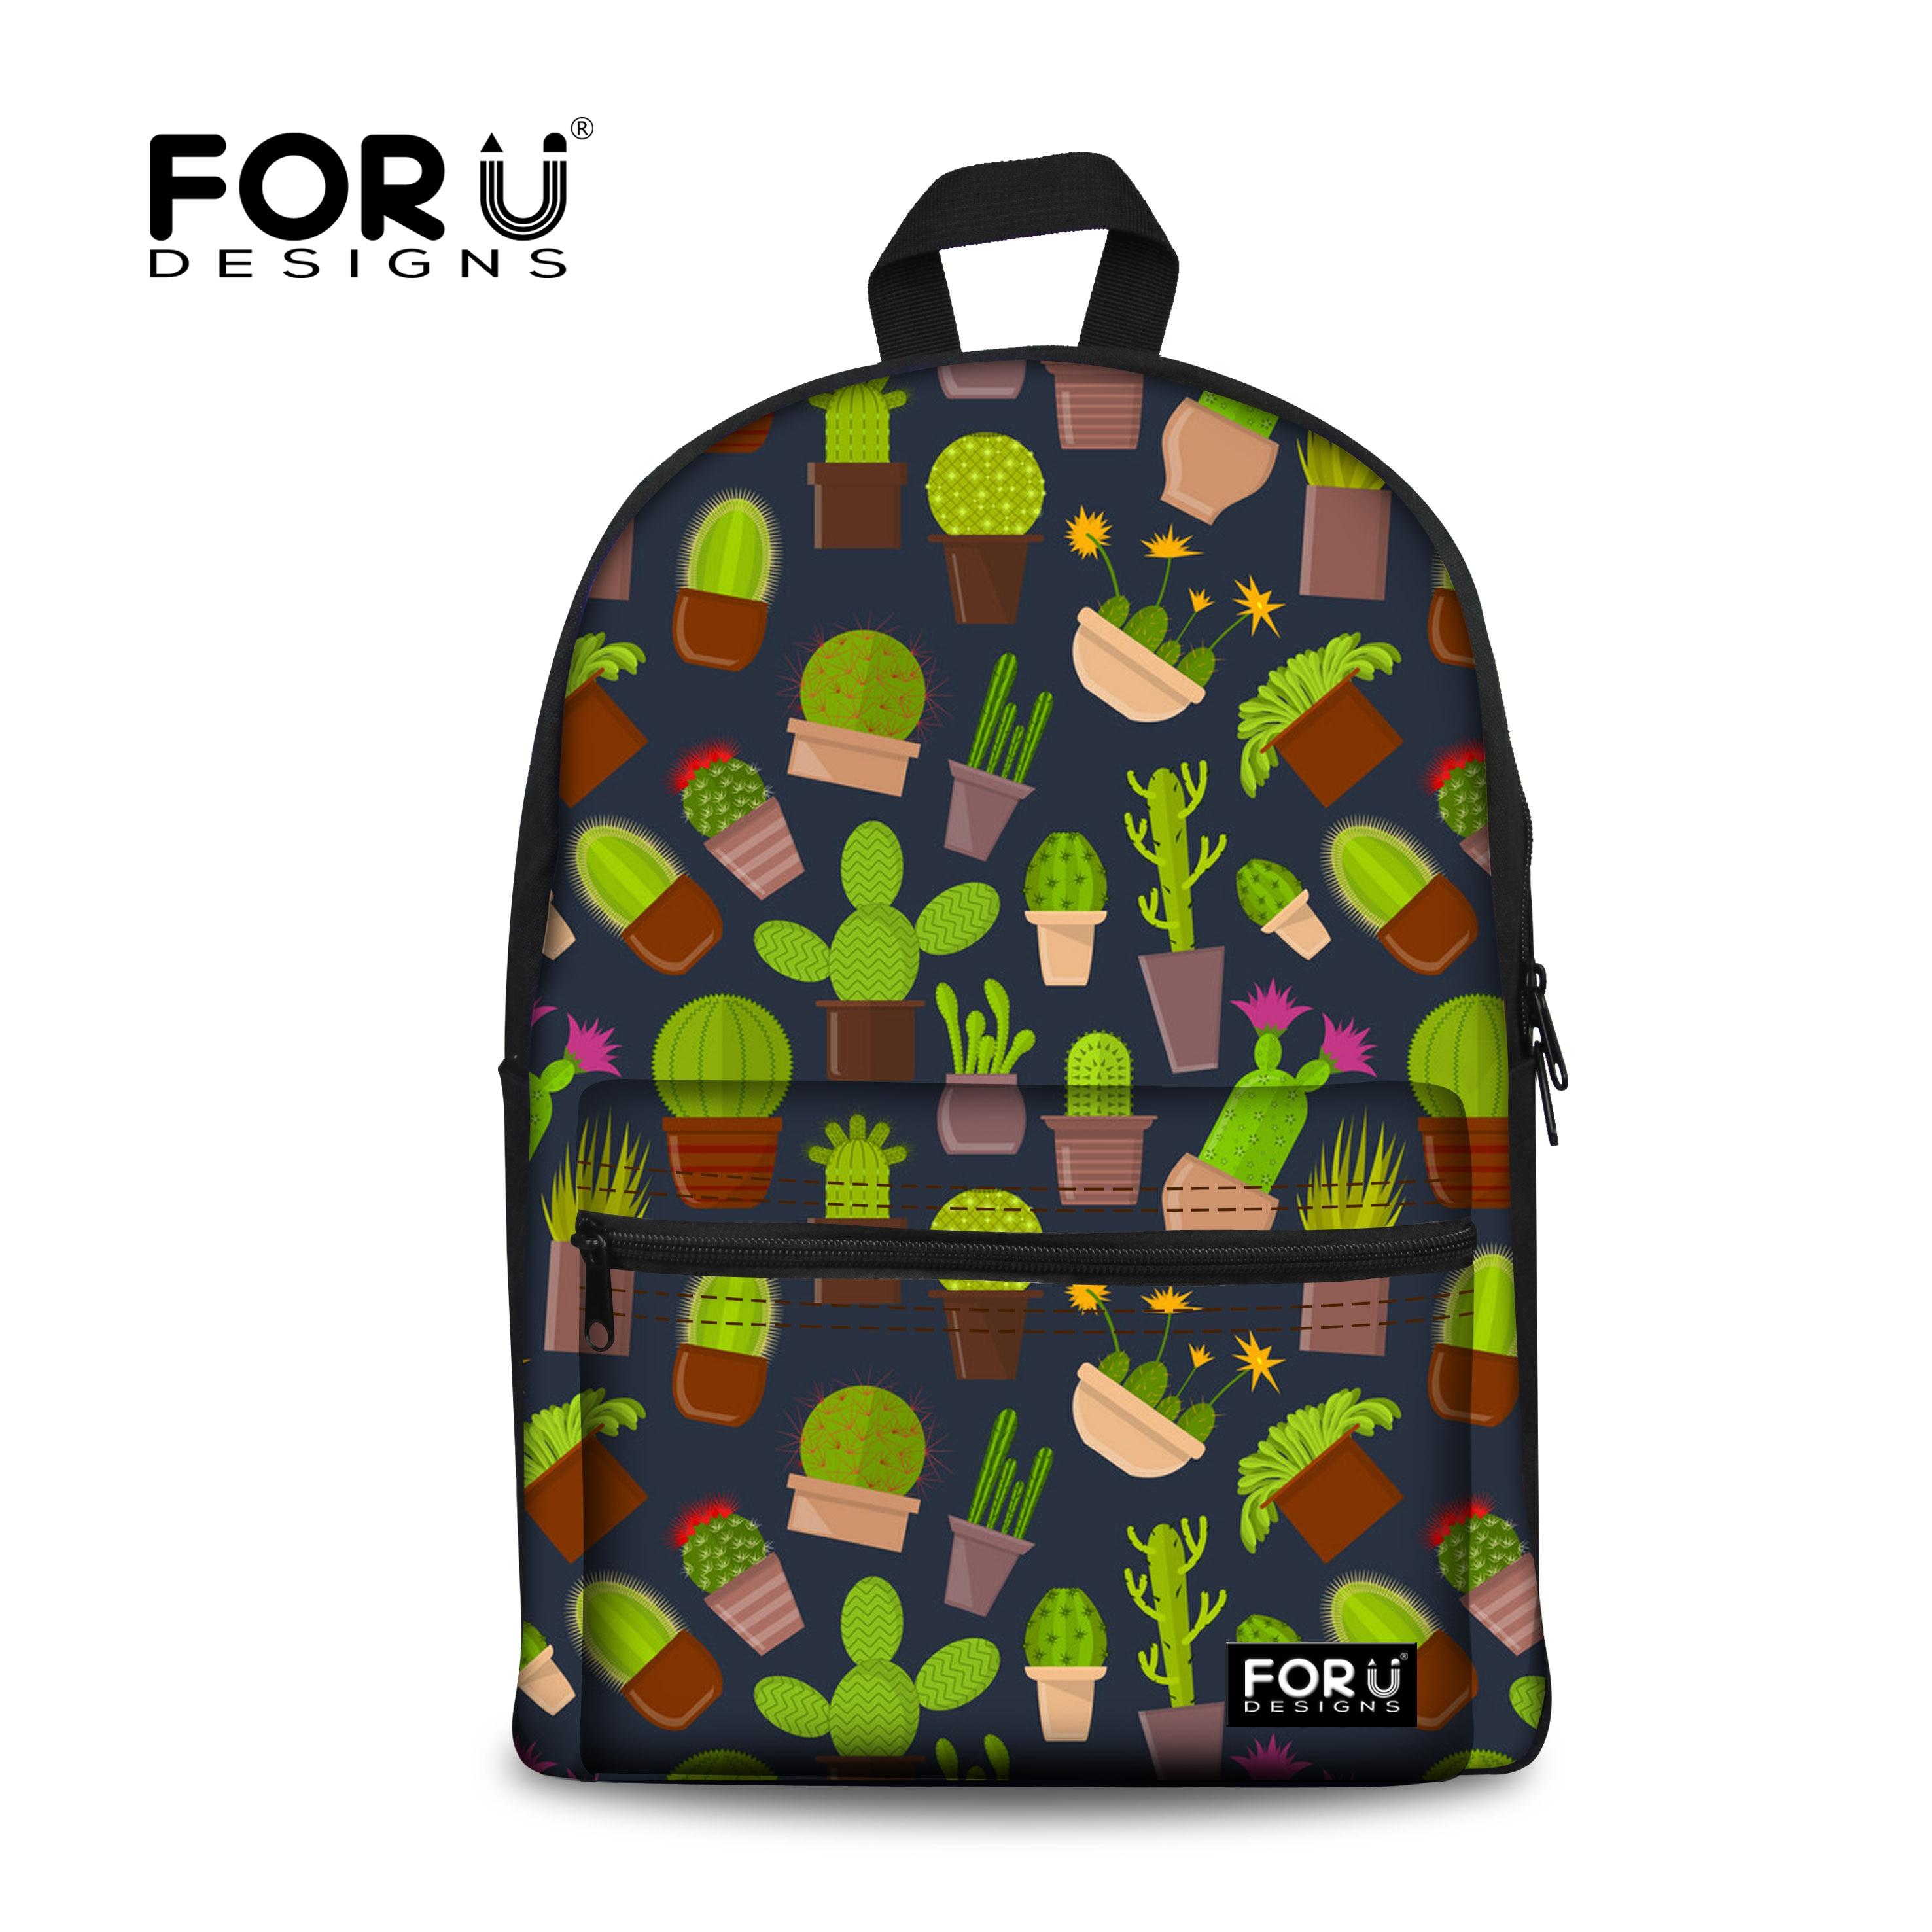 FORUDESIGNS Cute Cactus Print School Bags For Teenager Girls Fashion Kids Book Knapsacks Women Female Travel Backpack Schoolbag